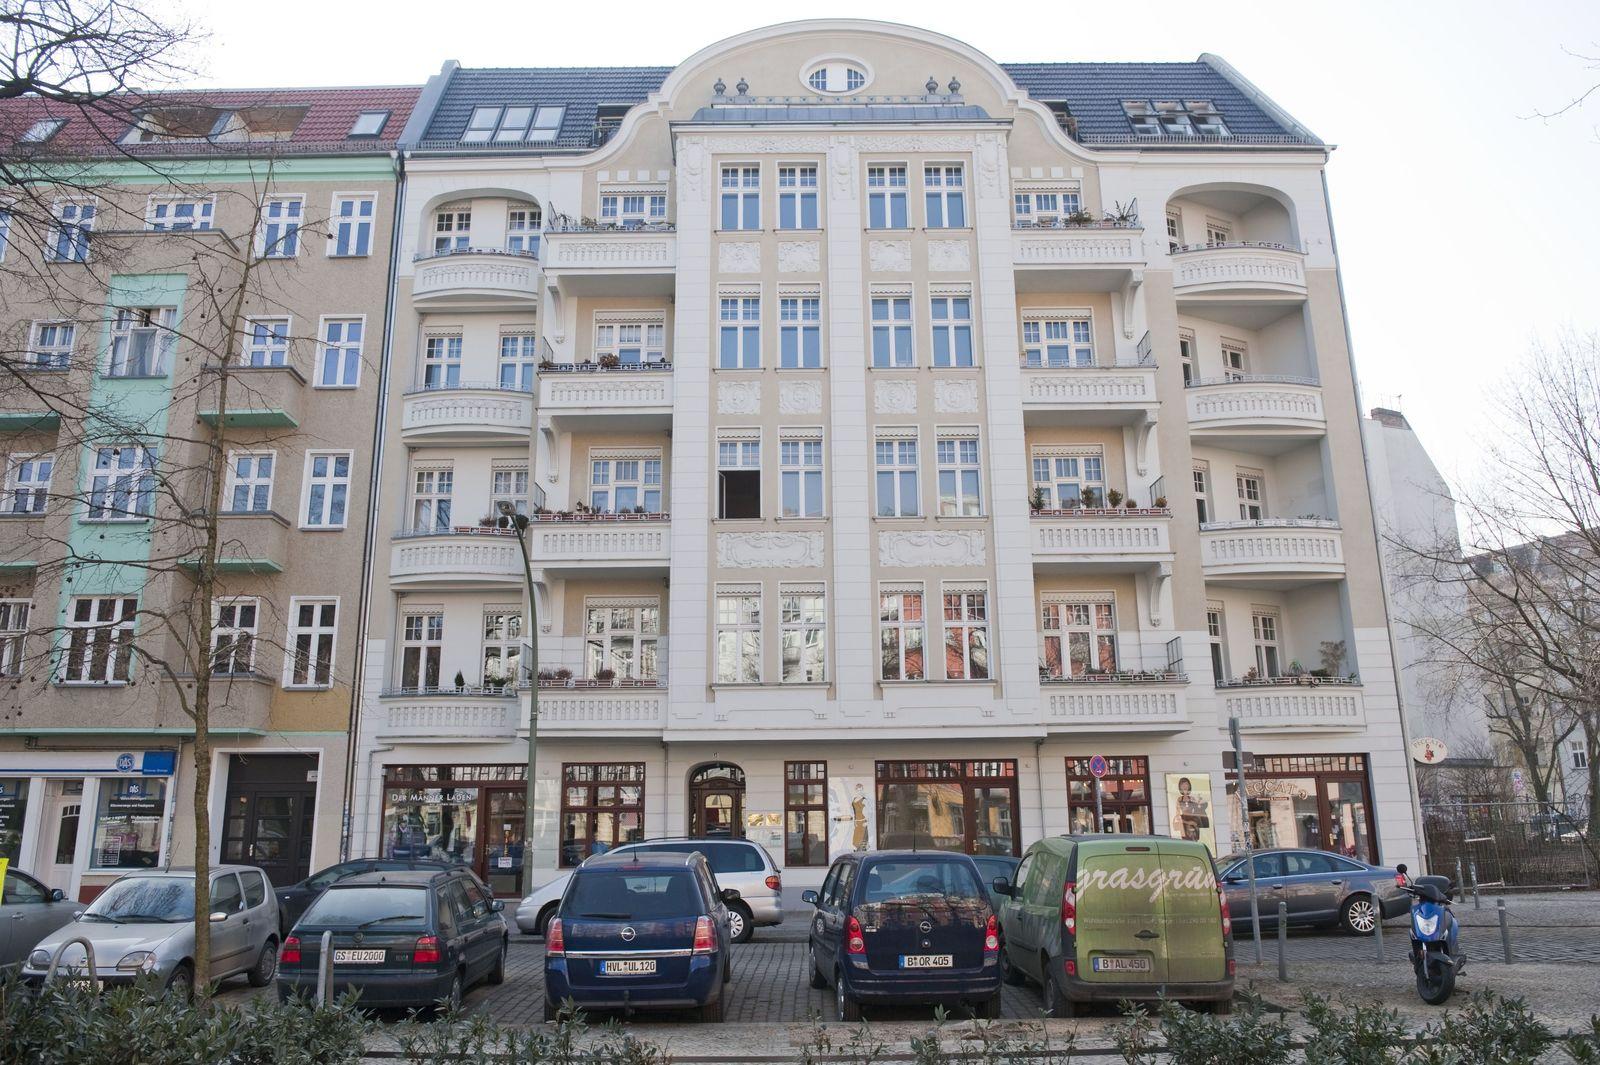 Altbau / Berlin